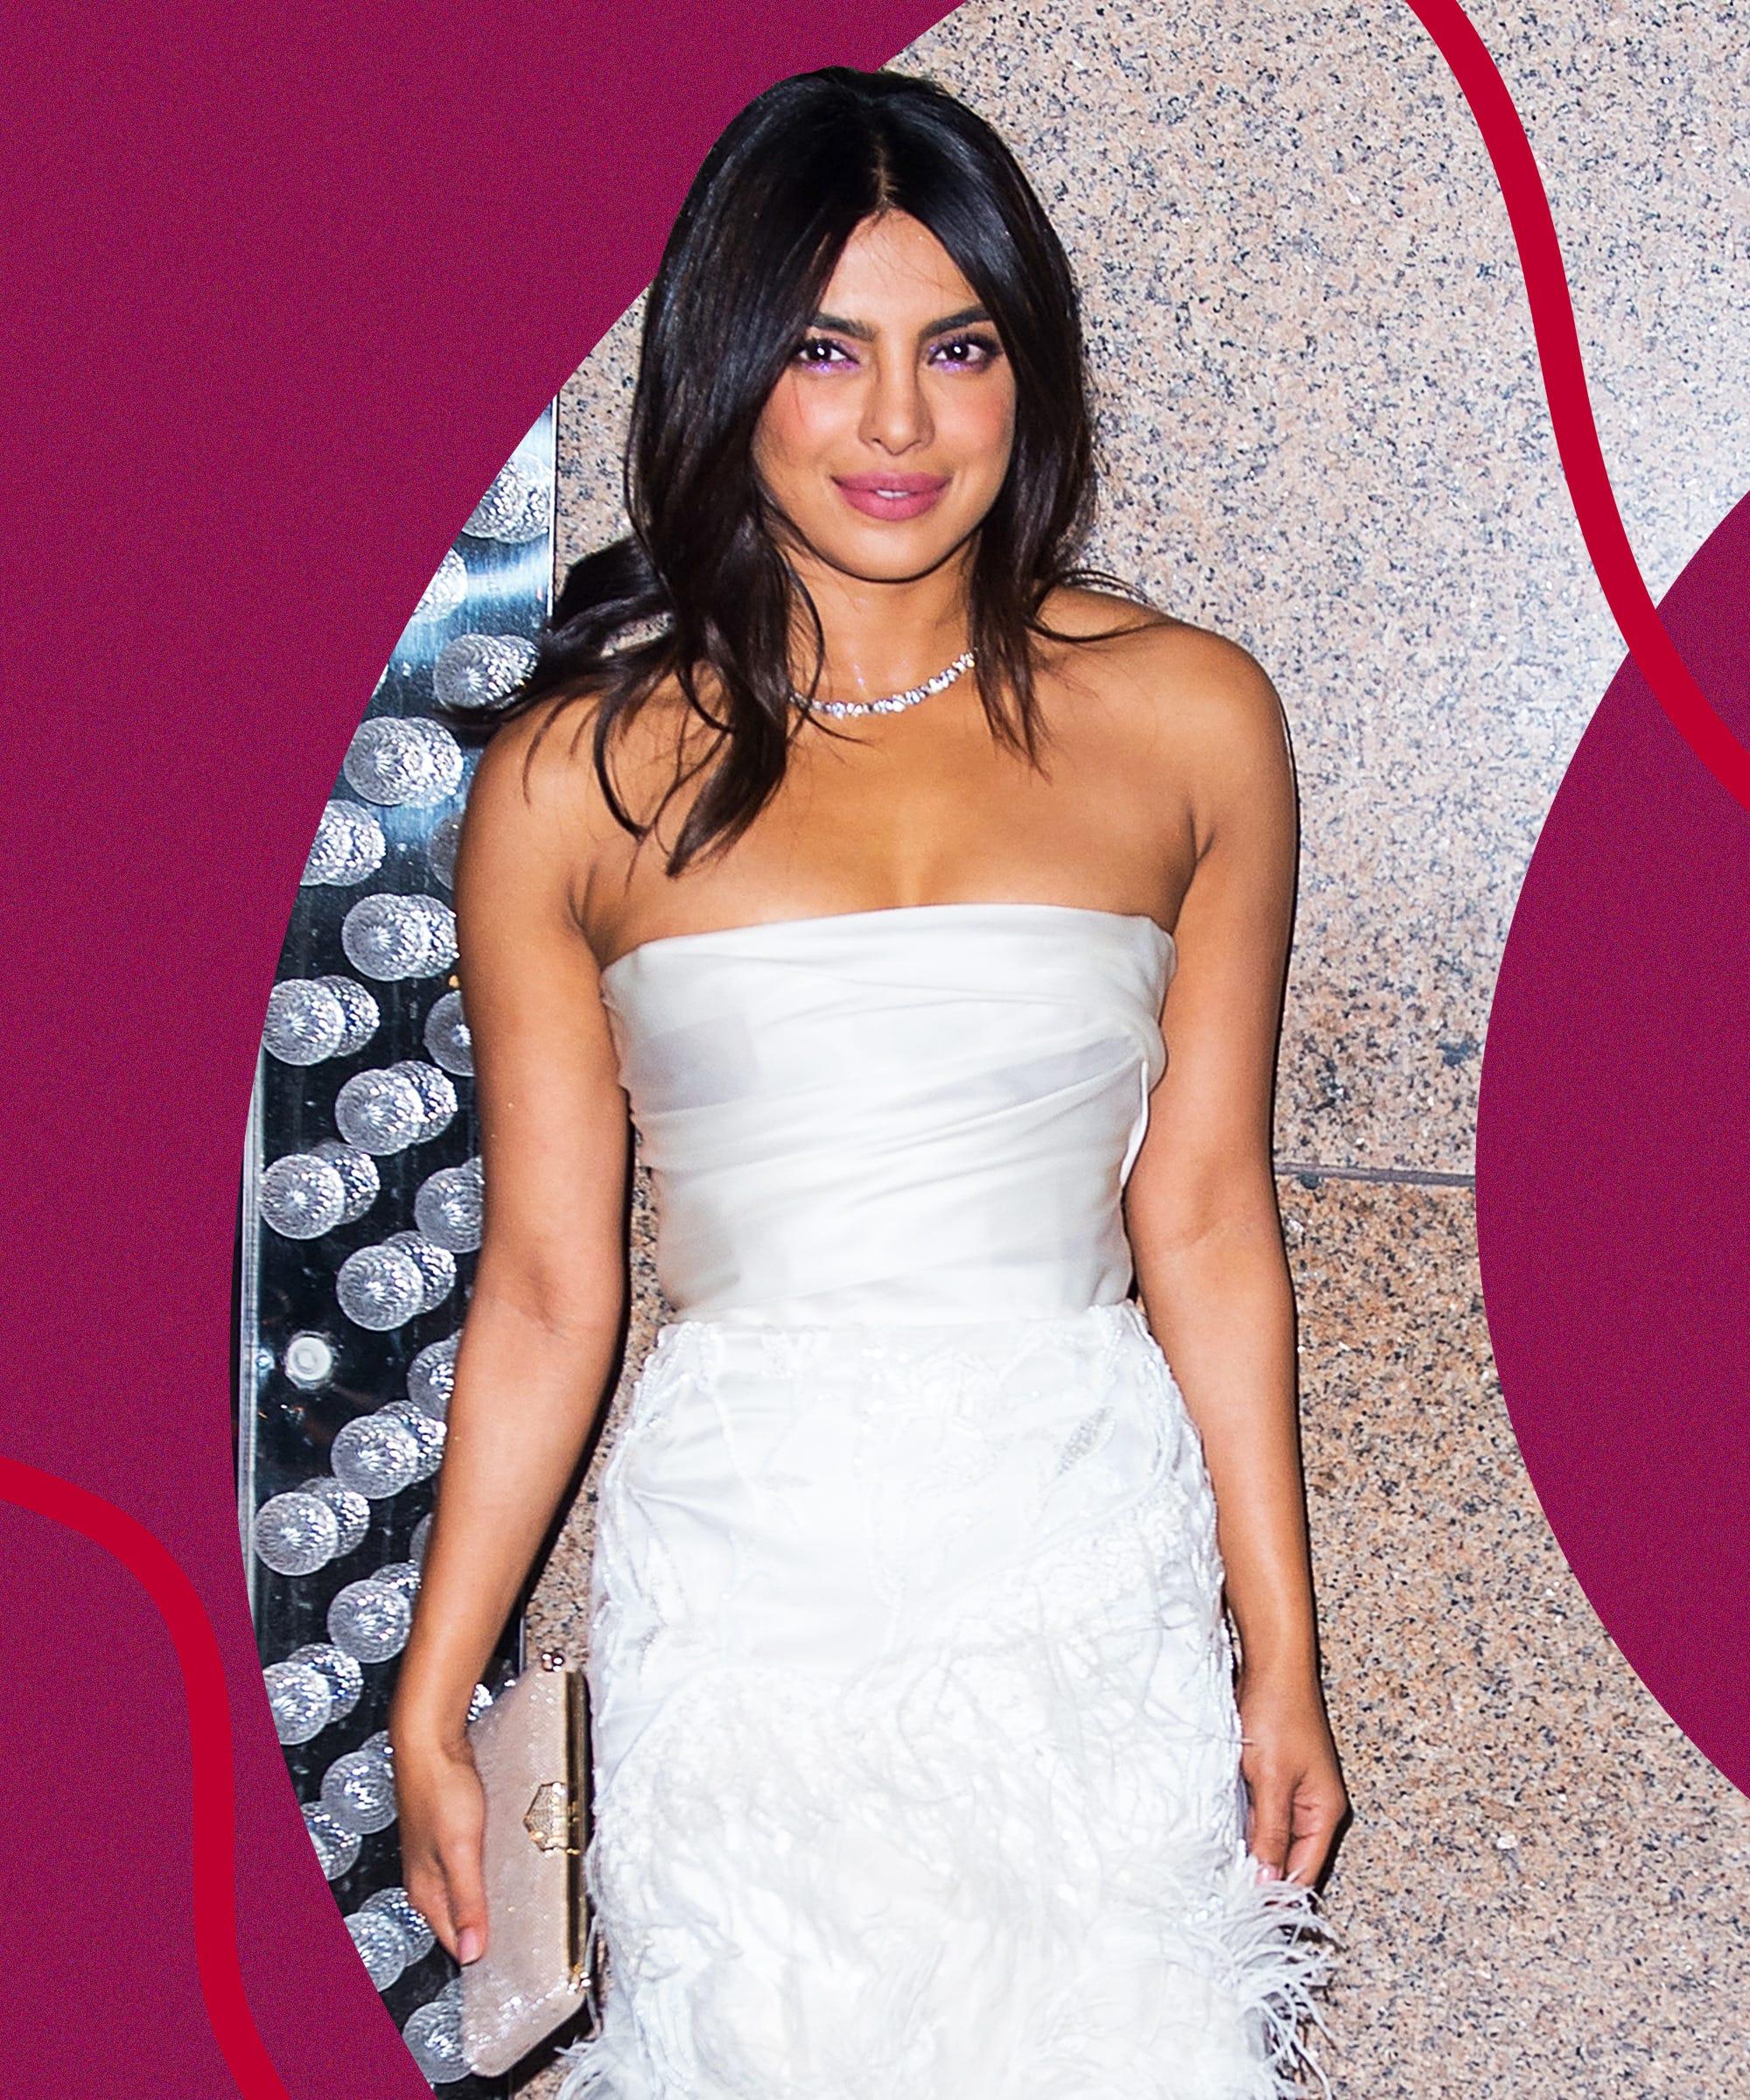 b16774c17501 See All Of Priyanka Chopra s Wedding Looks